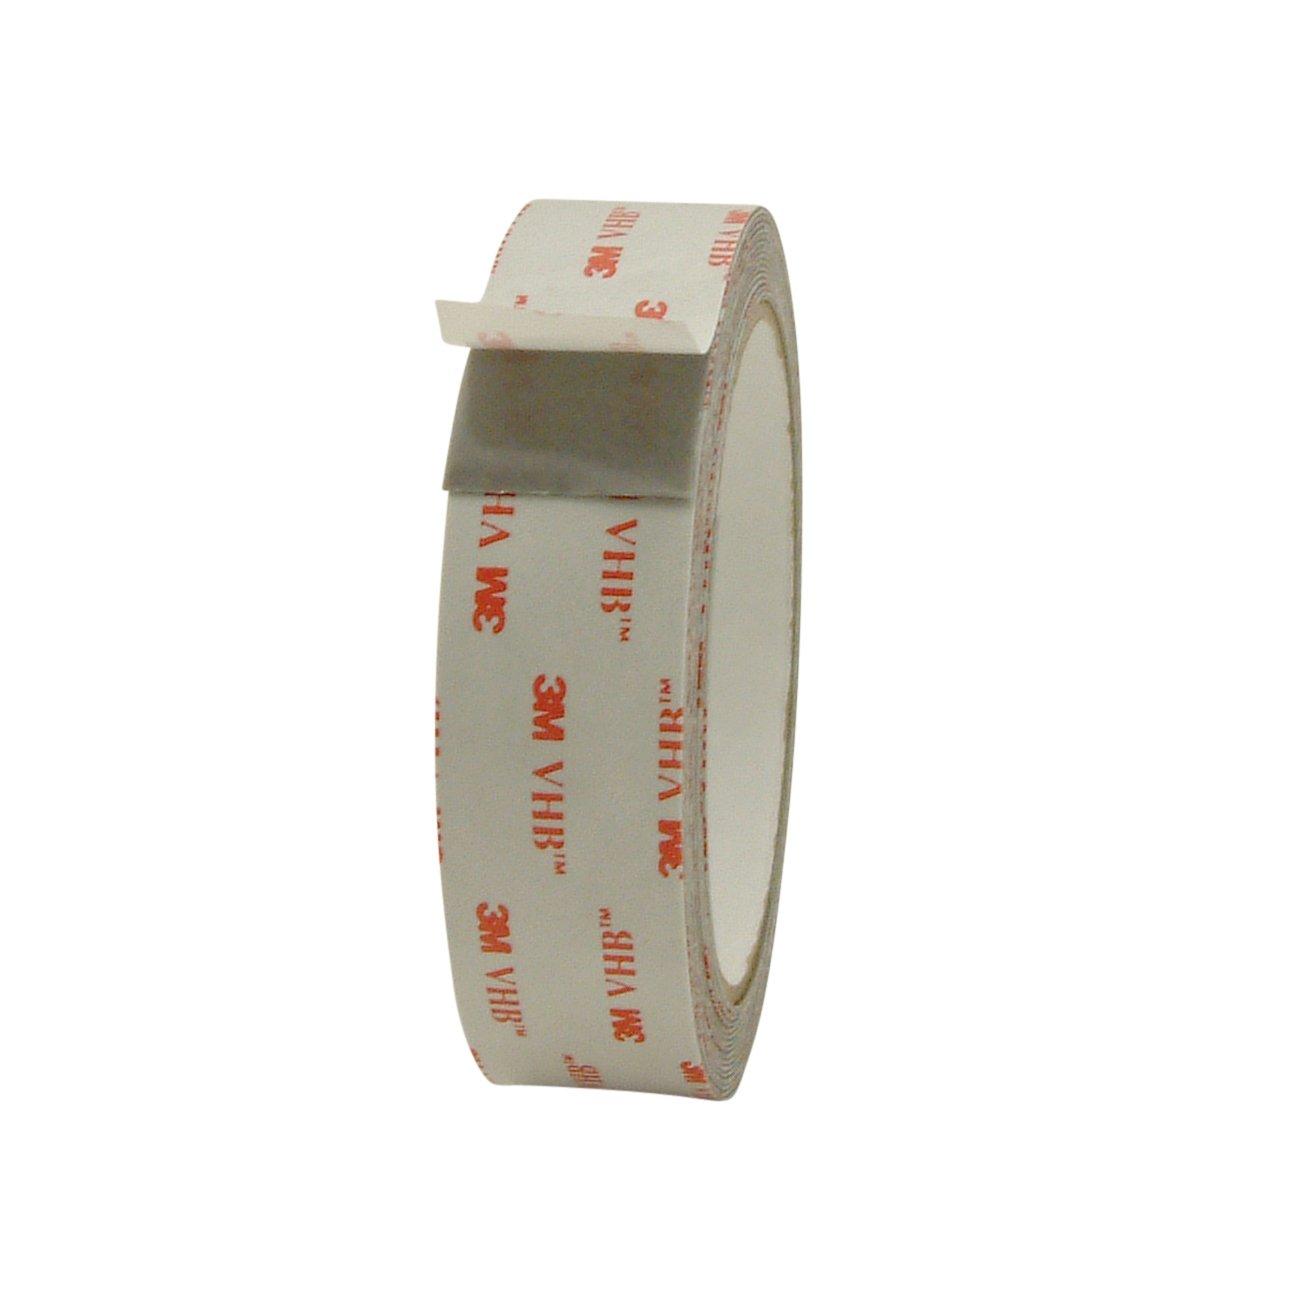 Scotch RP25 VHB Tape: 1/2 in.x 15 piedi. (Grigio) 3M Scotch RP25/GRY055